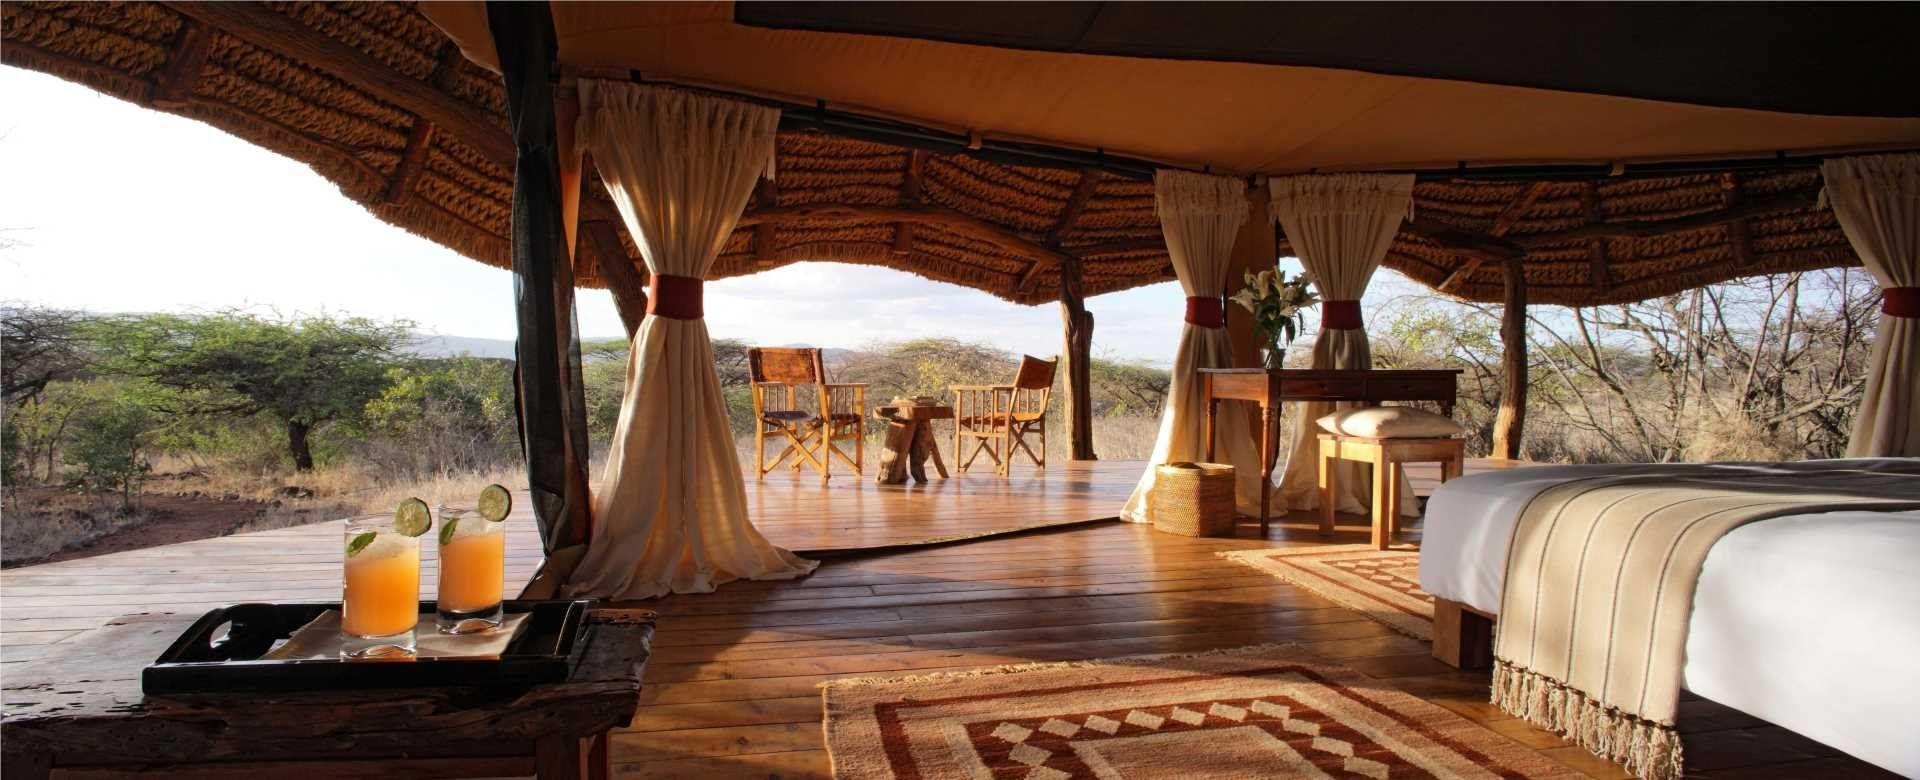 Safari Specialists - Luxury Safari Lodge